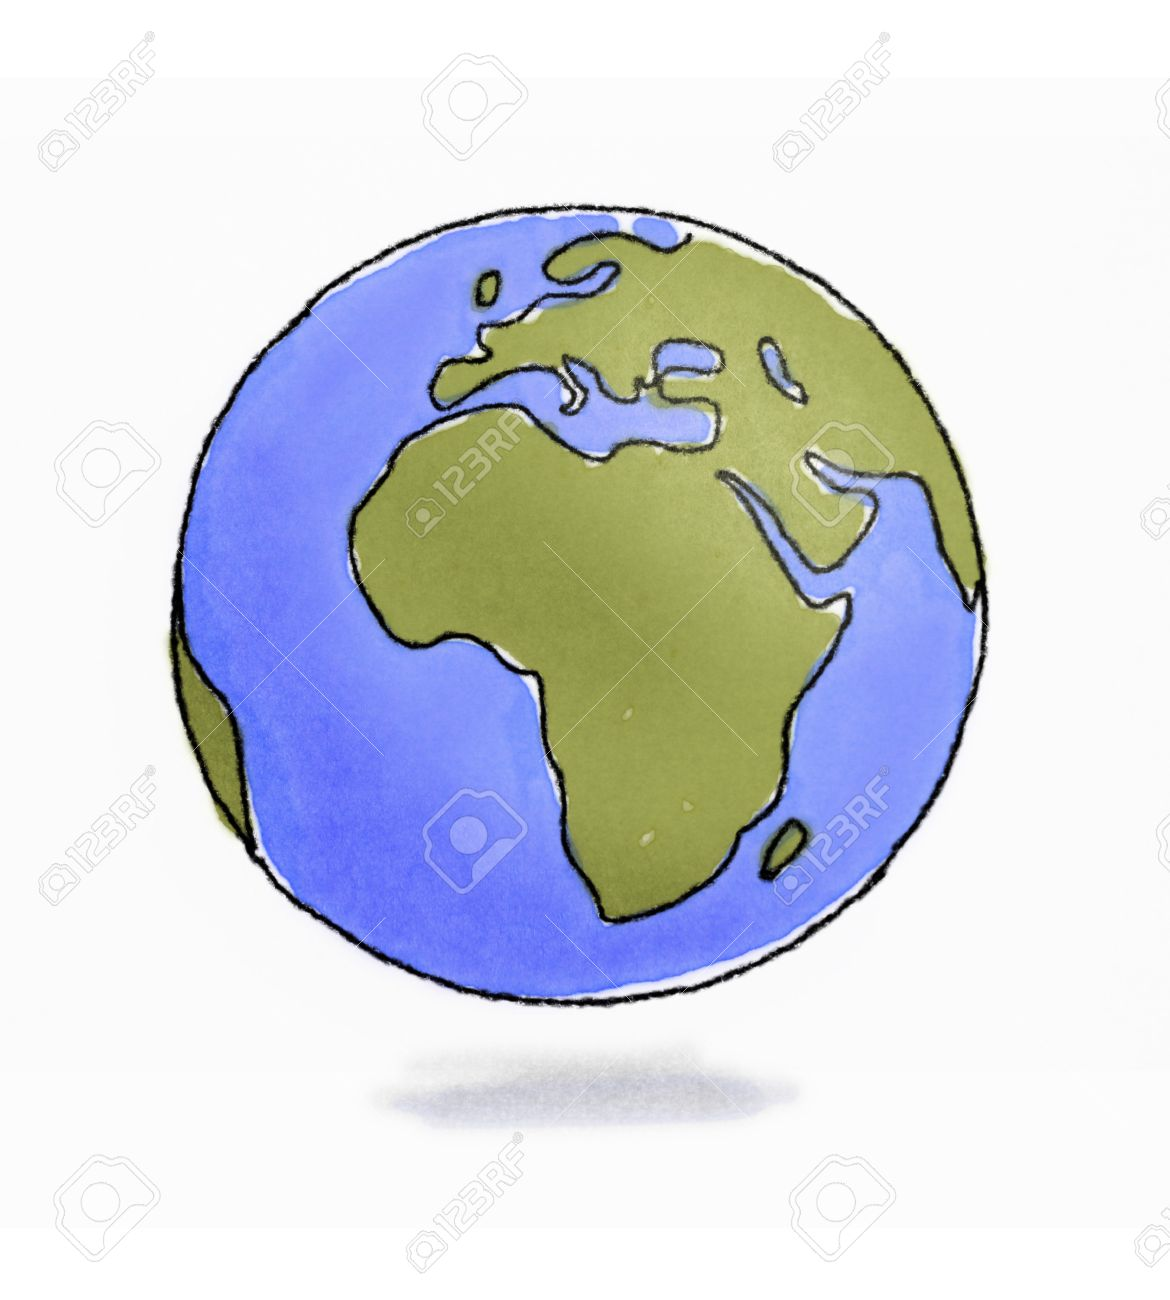 Hand drawn sketchy Earth pencil and watercolors - 30657070